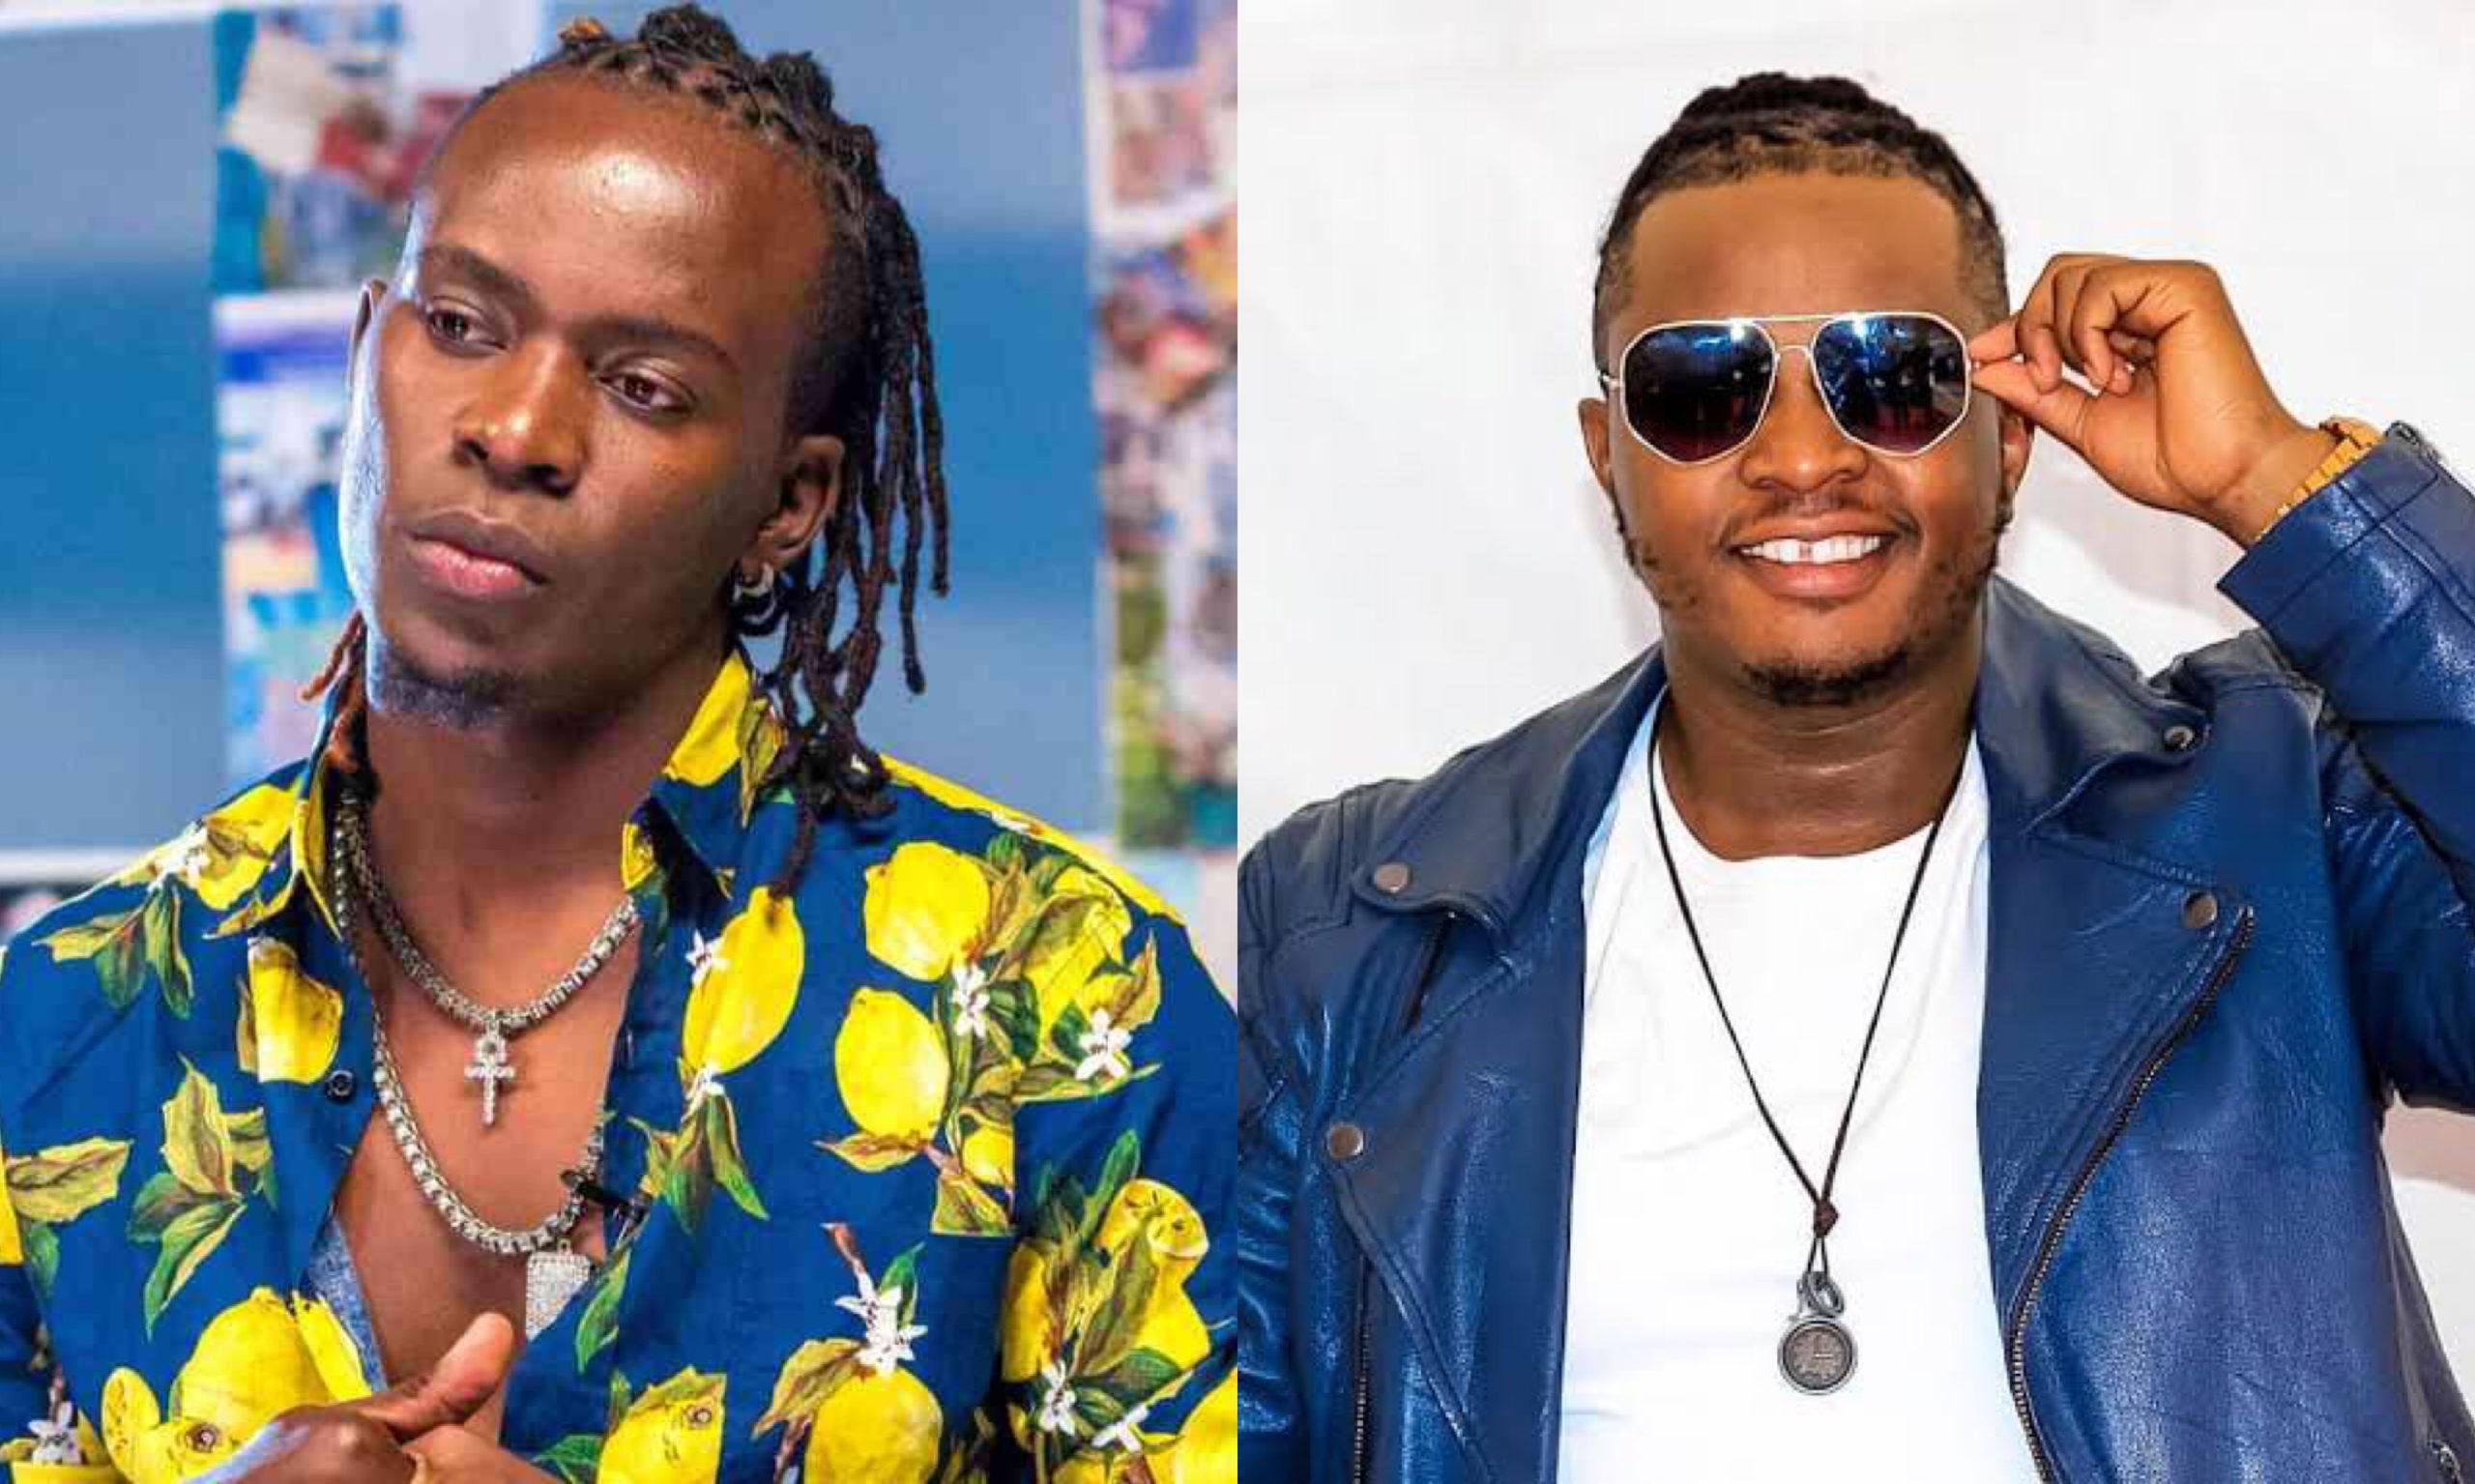 Wueh! Willy Paul takes a swipe at DK Kwenye Beat's health in new video